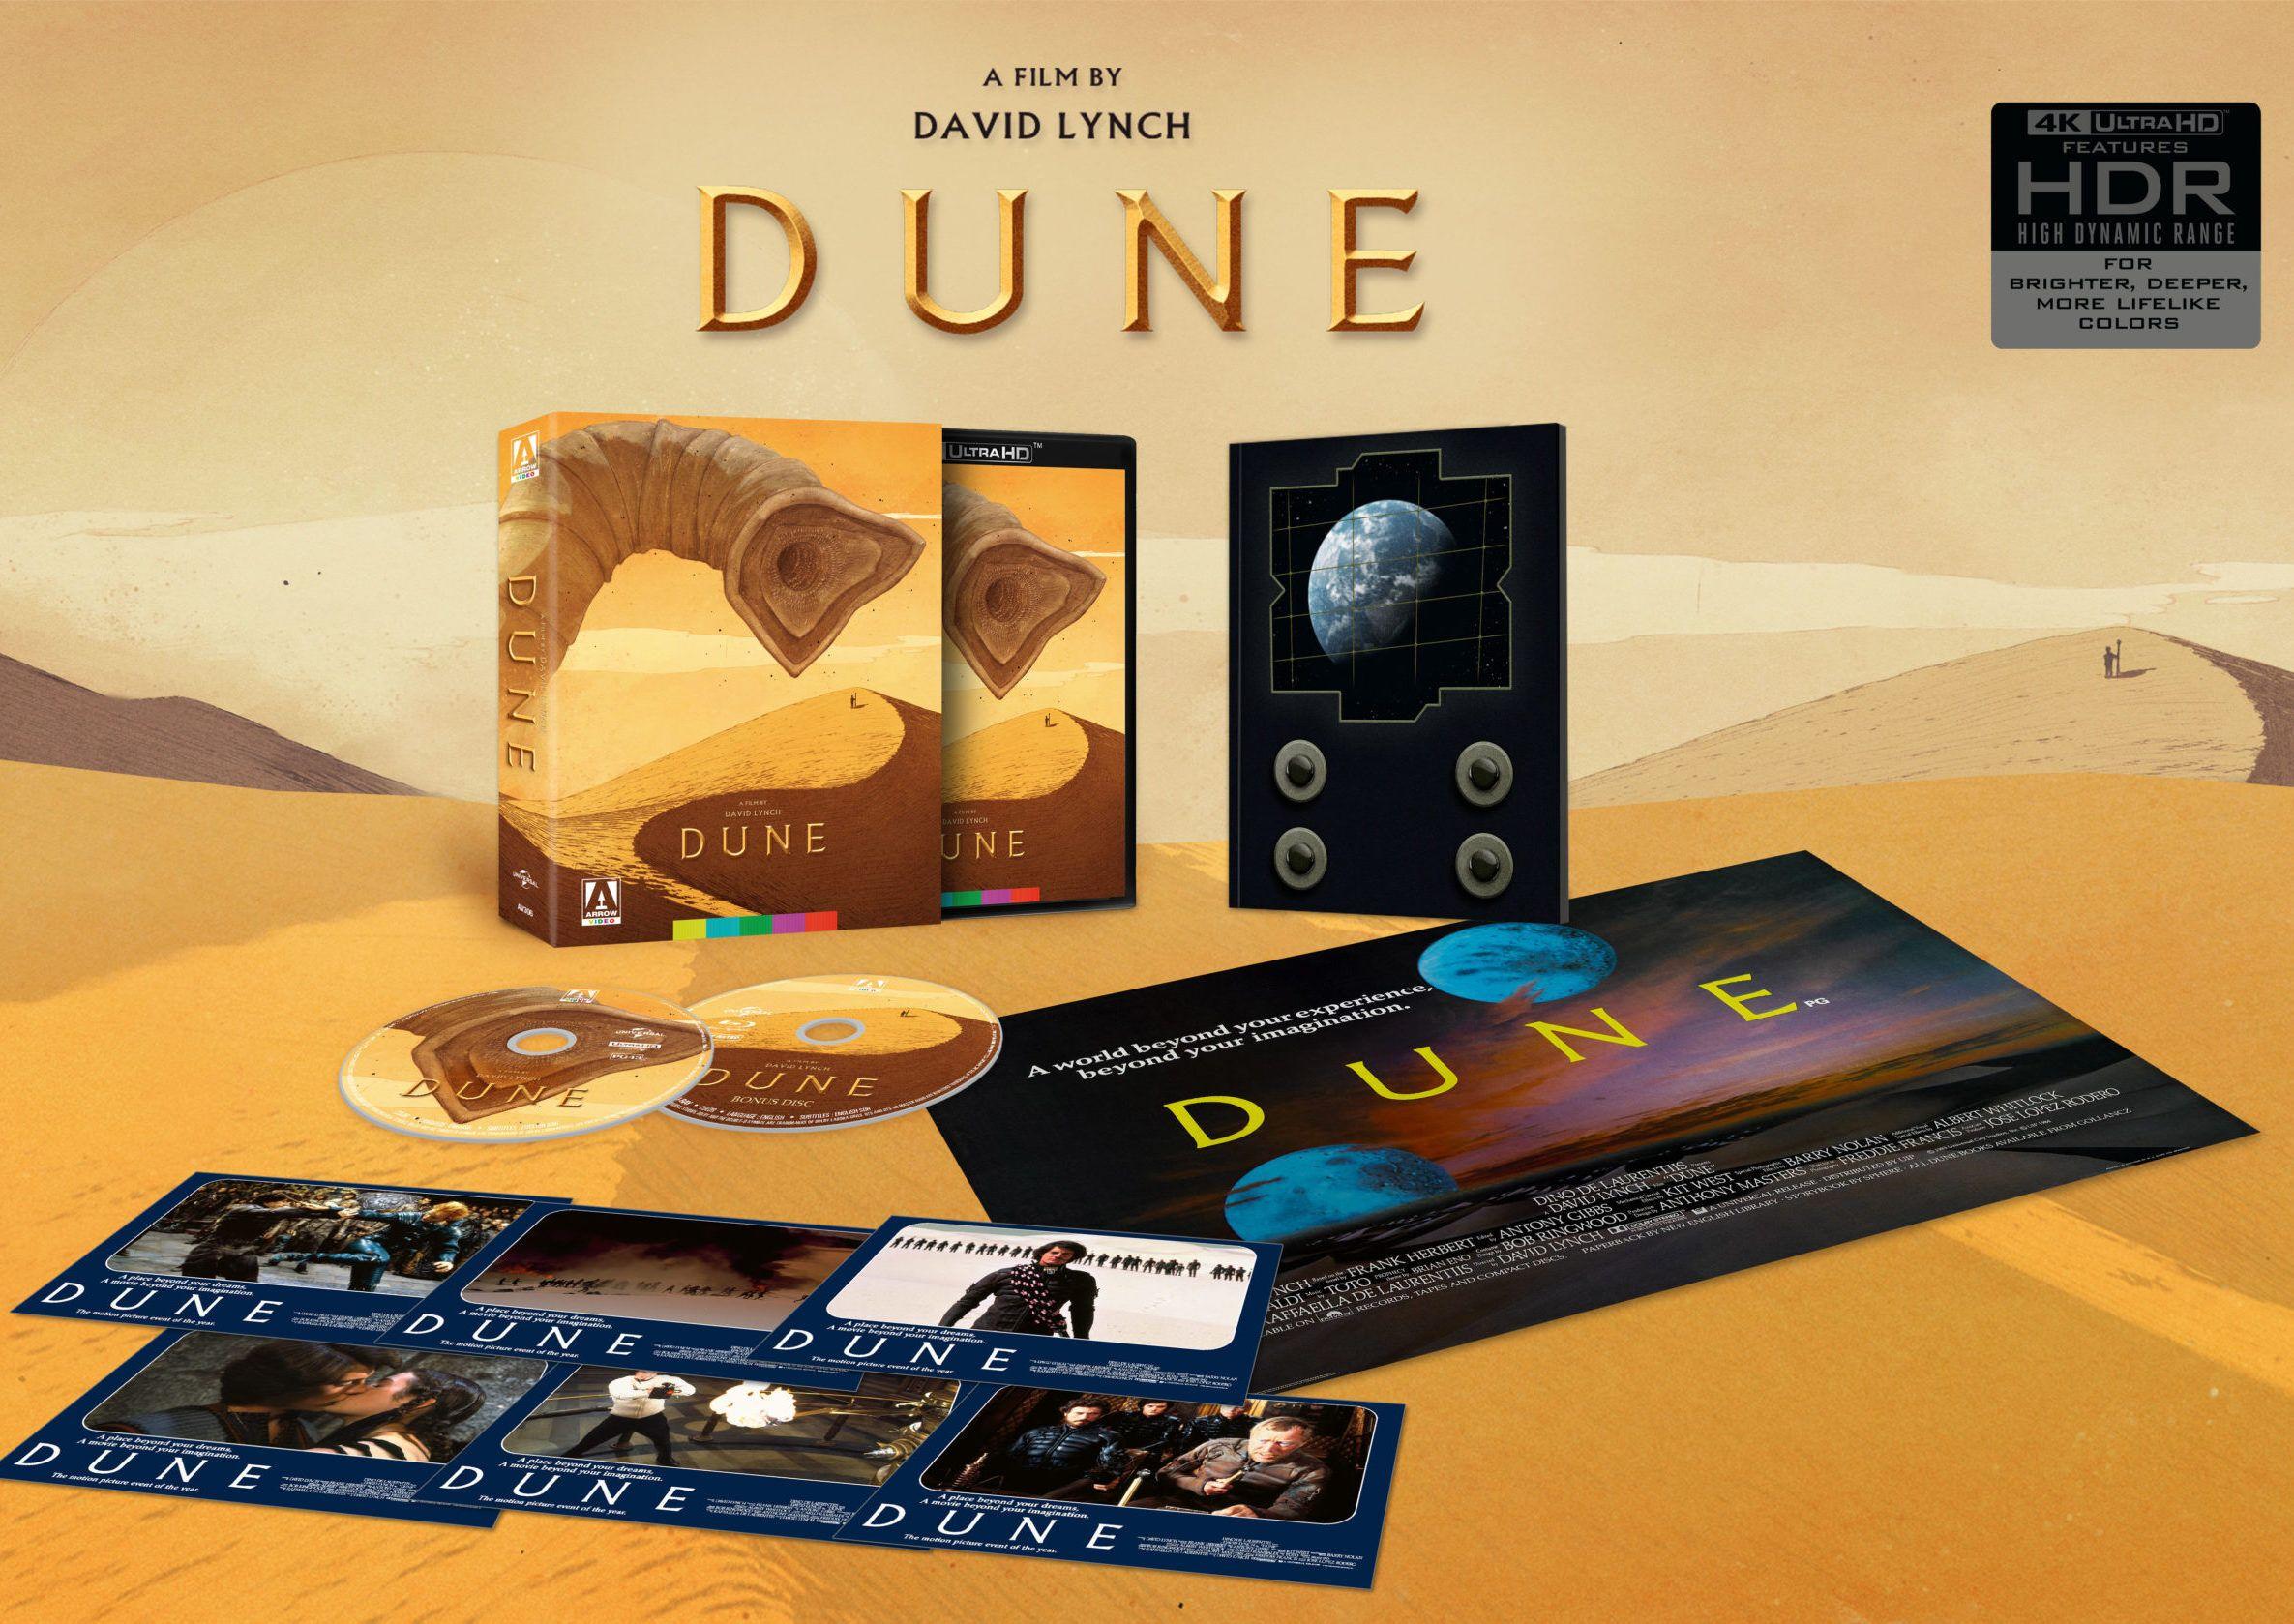 David Lynch's Dune 4K Blu-ray Release Date Revealed